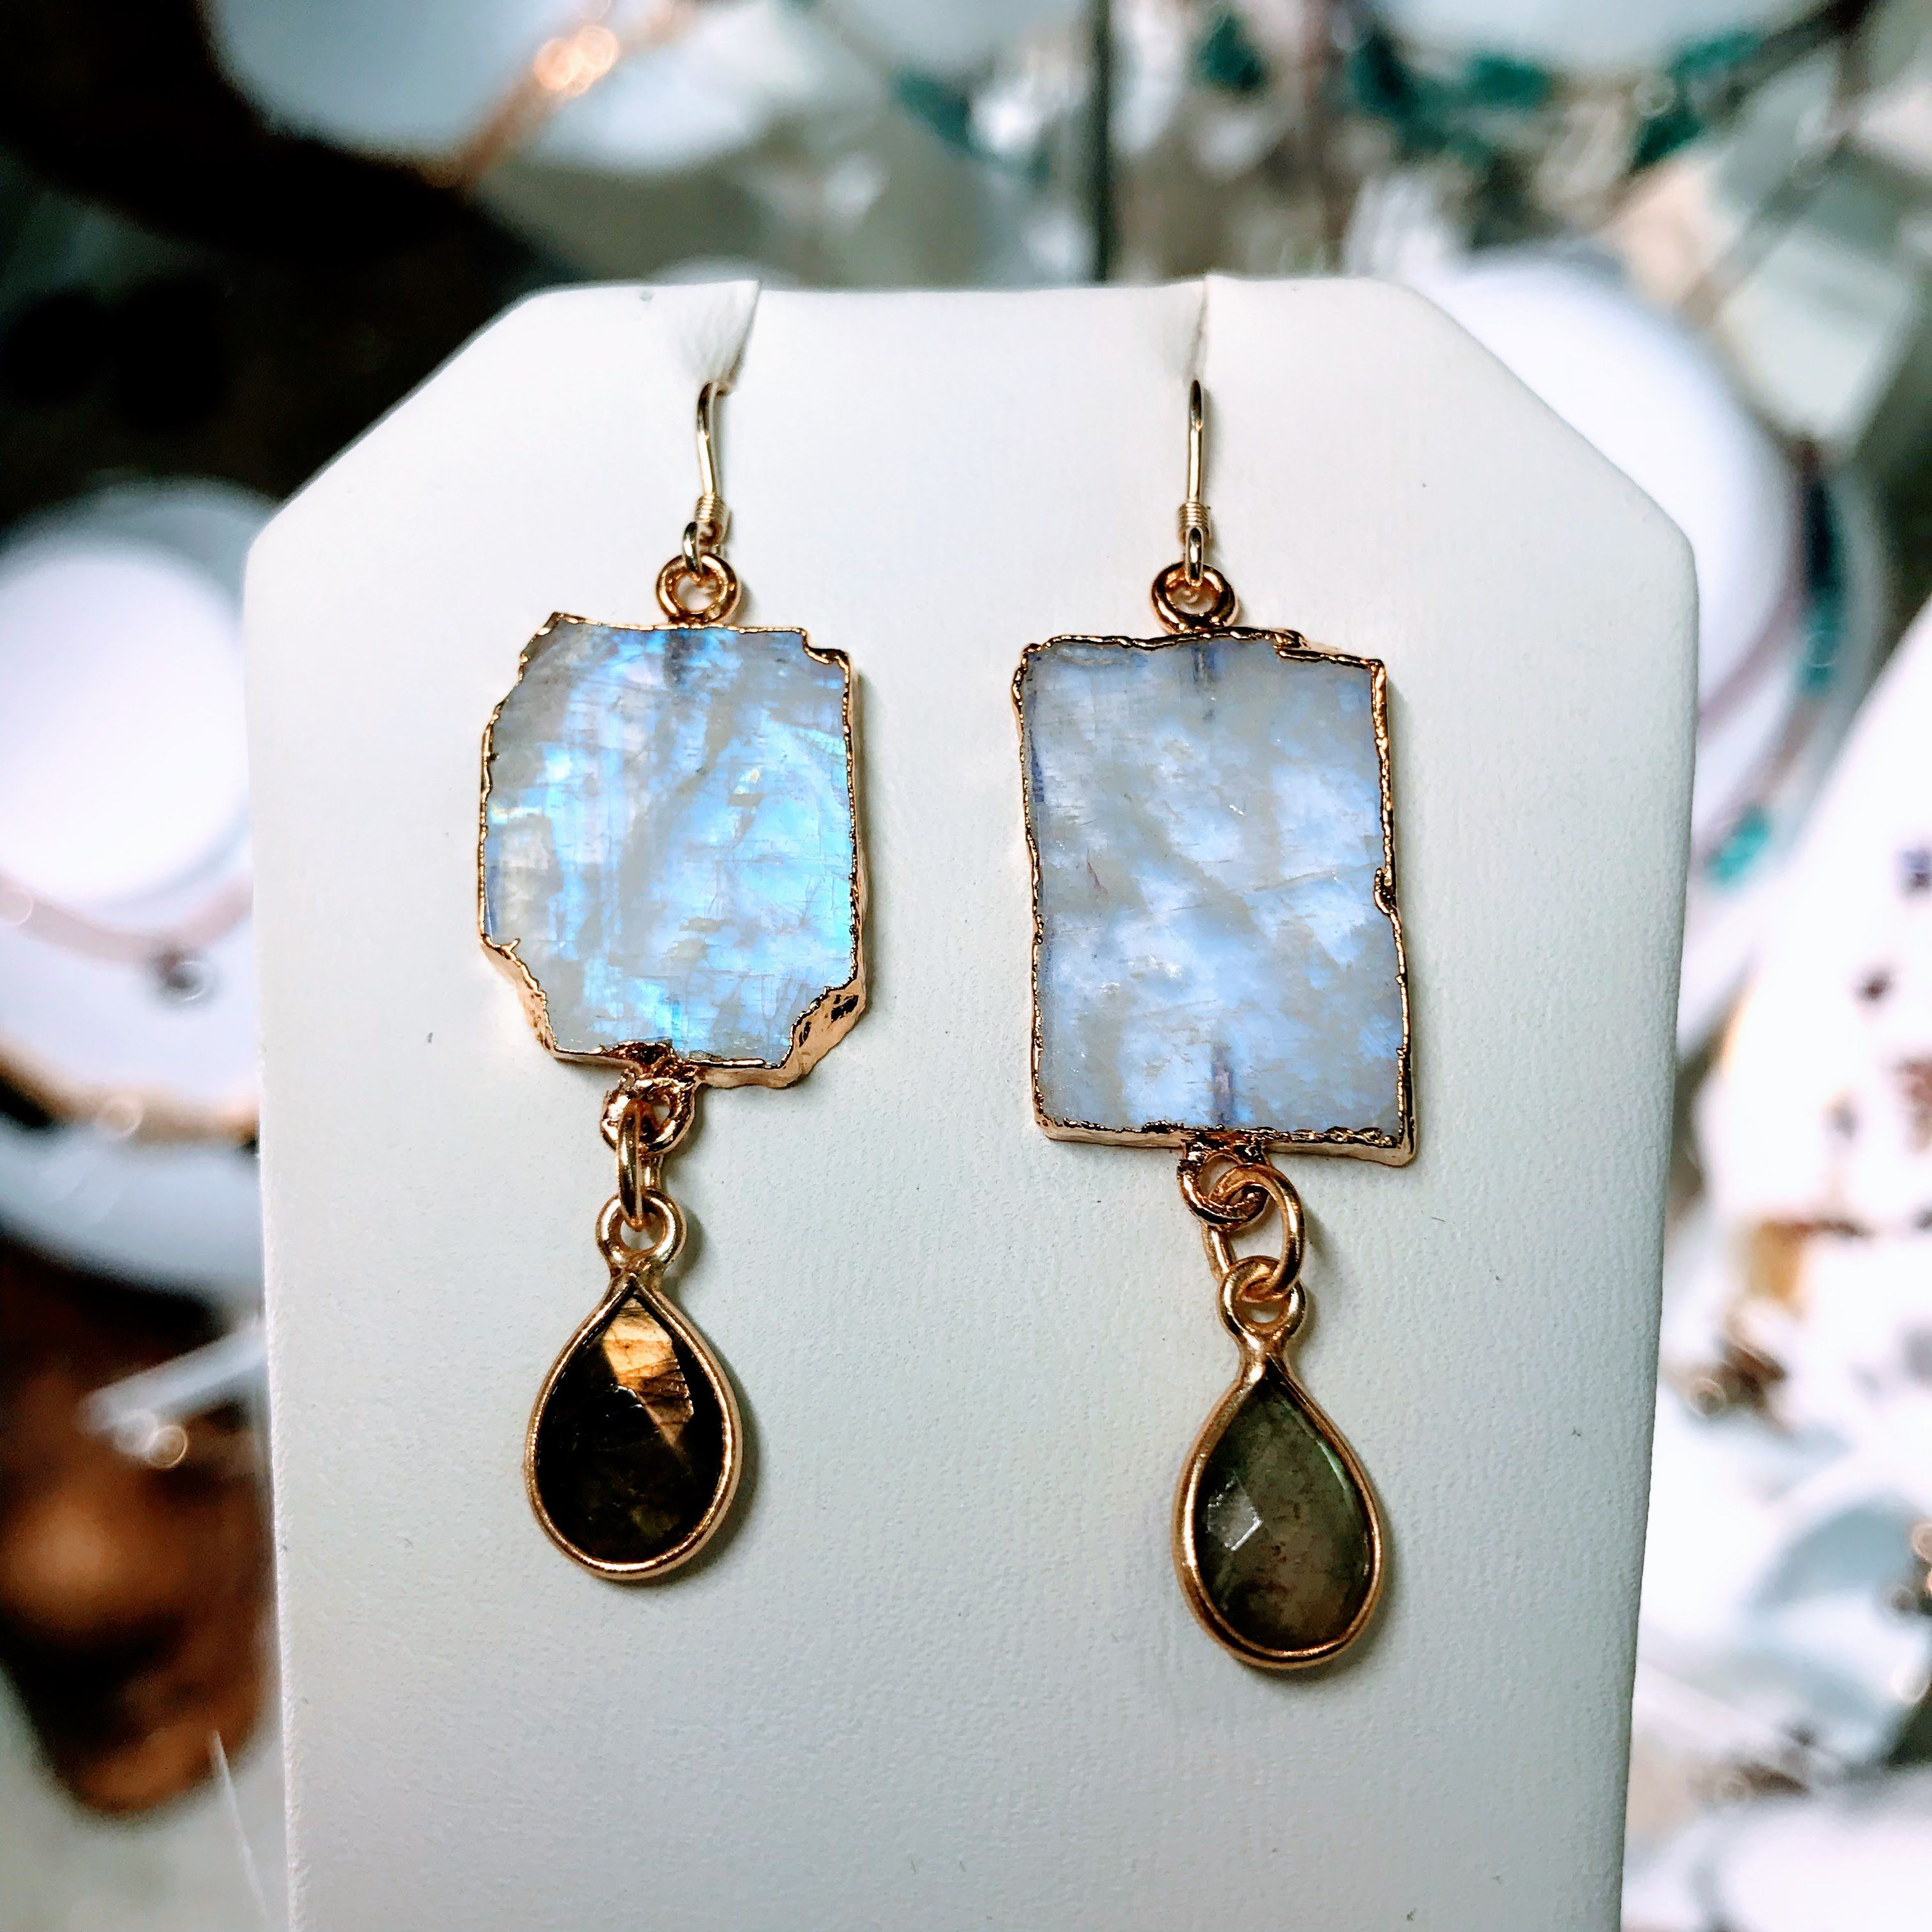 Moonstone /& Labradorite Drop earrings